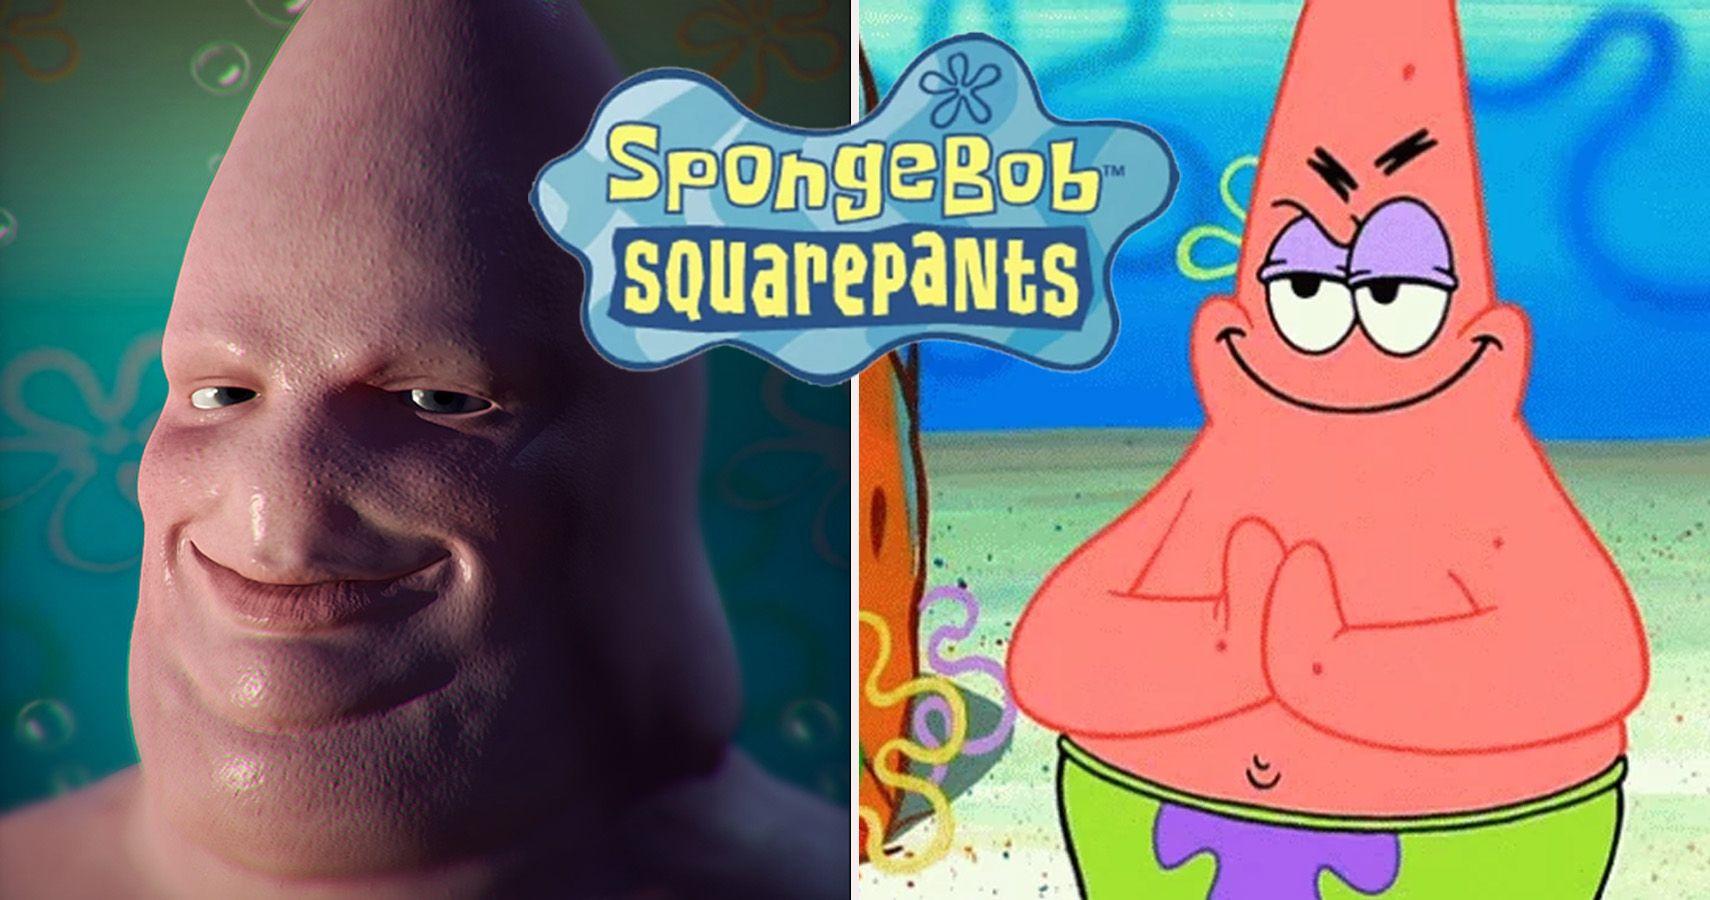 SpongeBob SquarePants: Shocking Things You Never Knew About